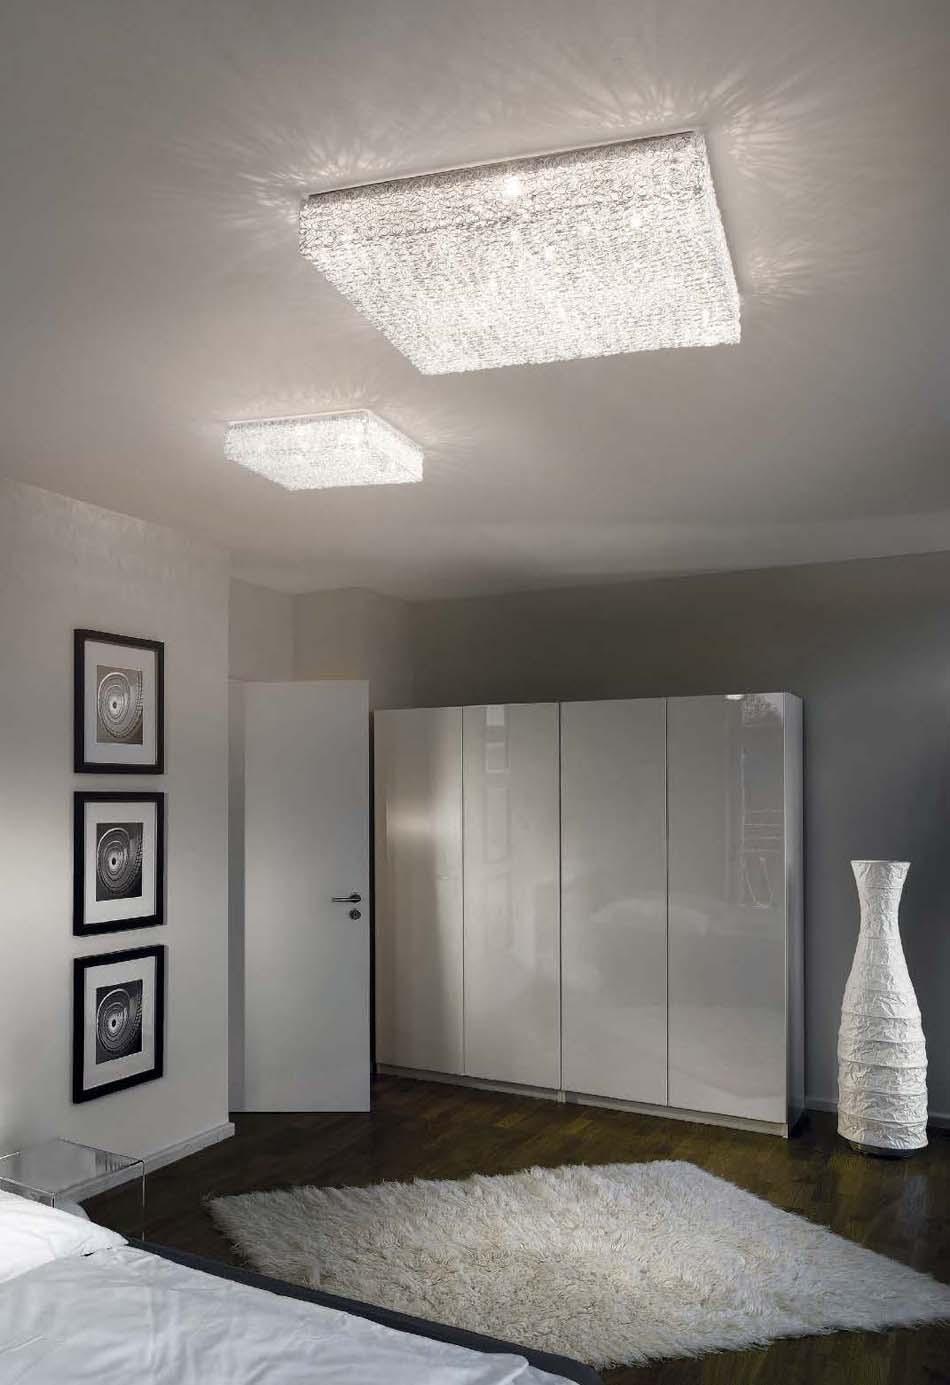 Lampade sospensione Ideal Lux Quadro – Bruni Arredamenti